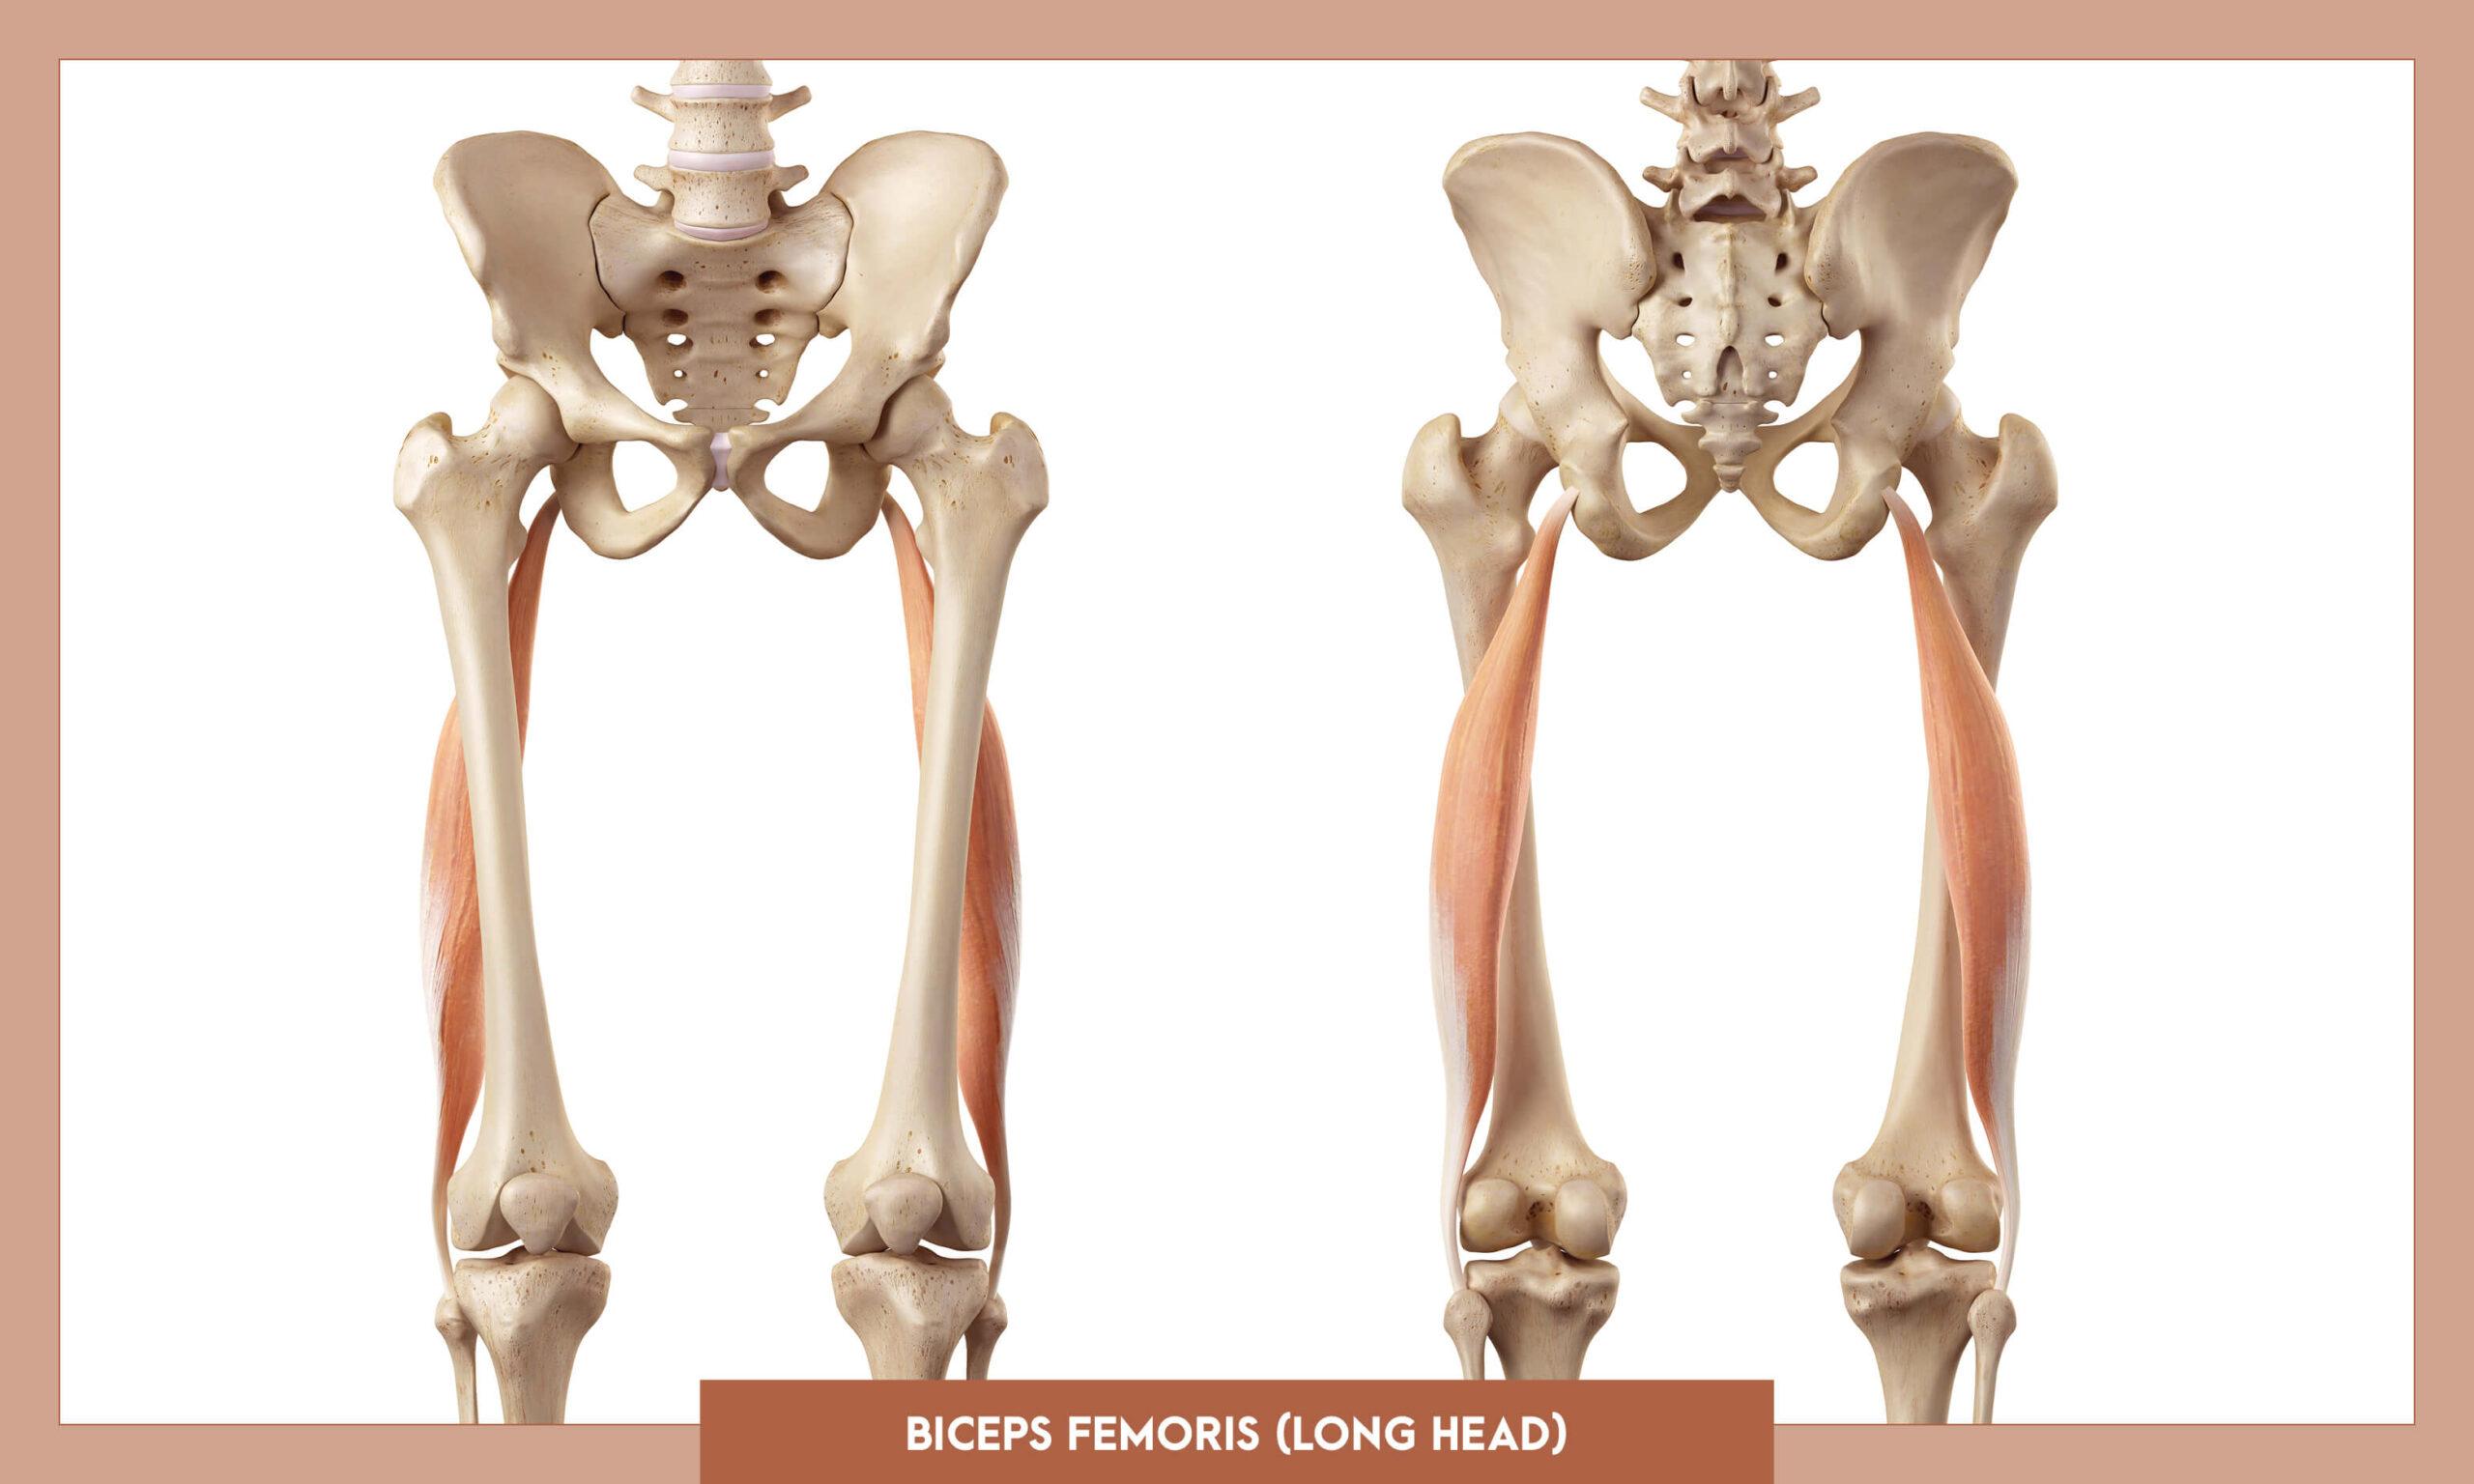 Muscles of the Lower Limb -Biceps femoris long head